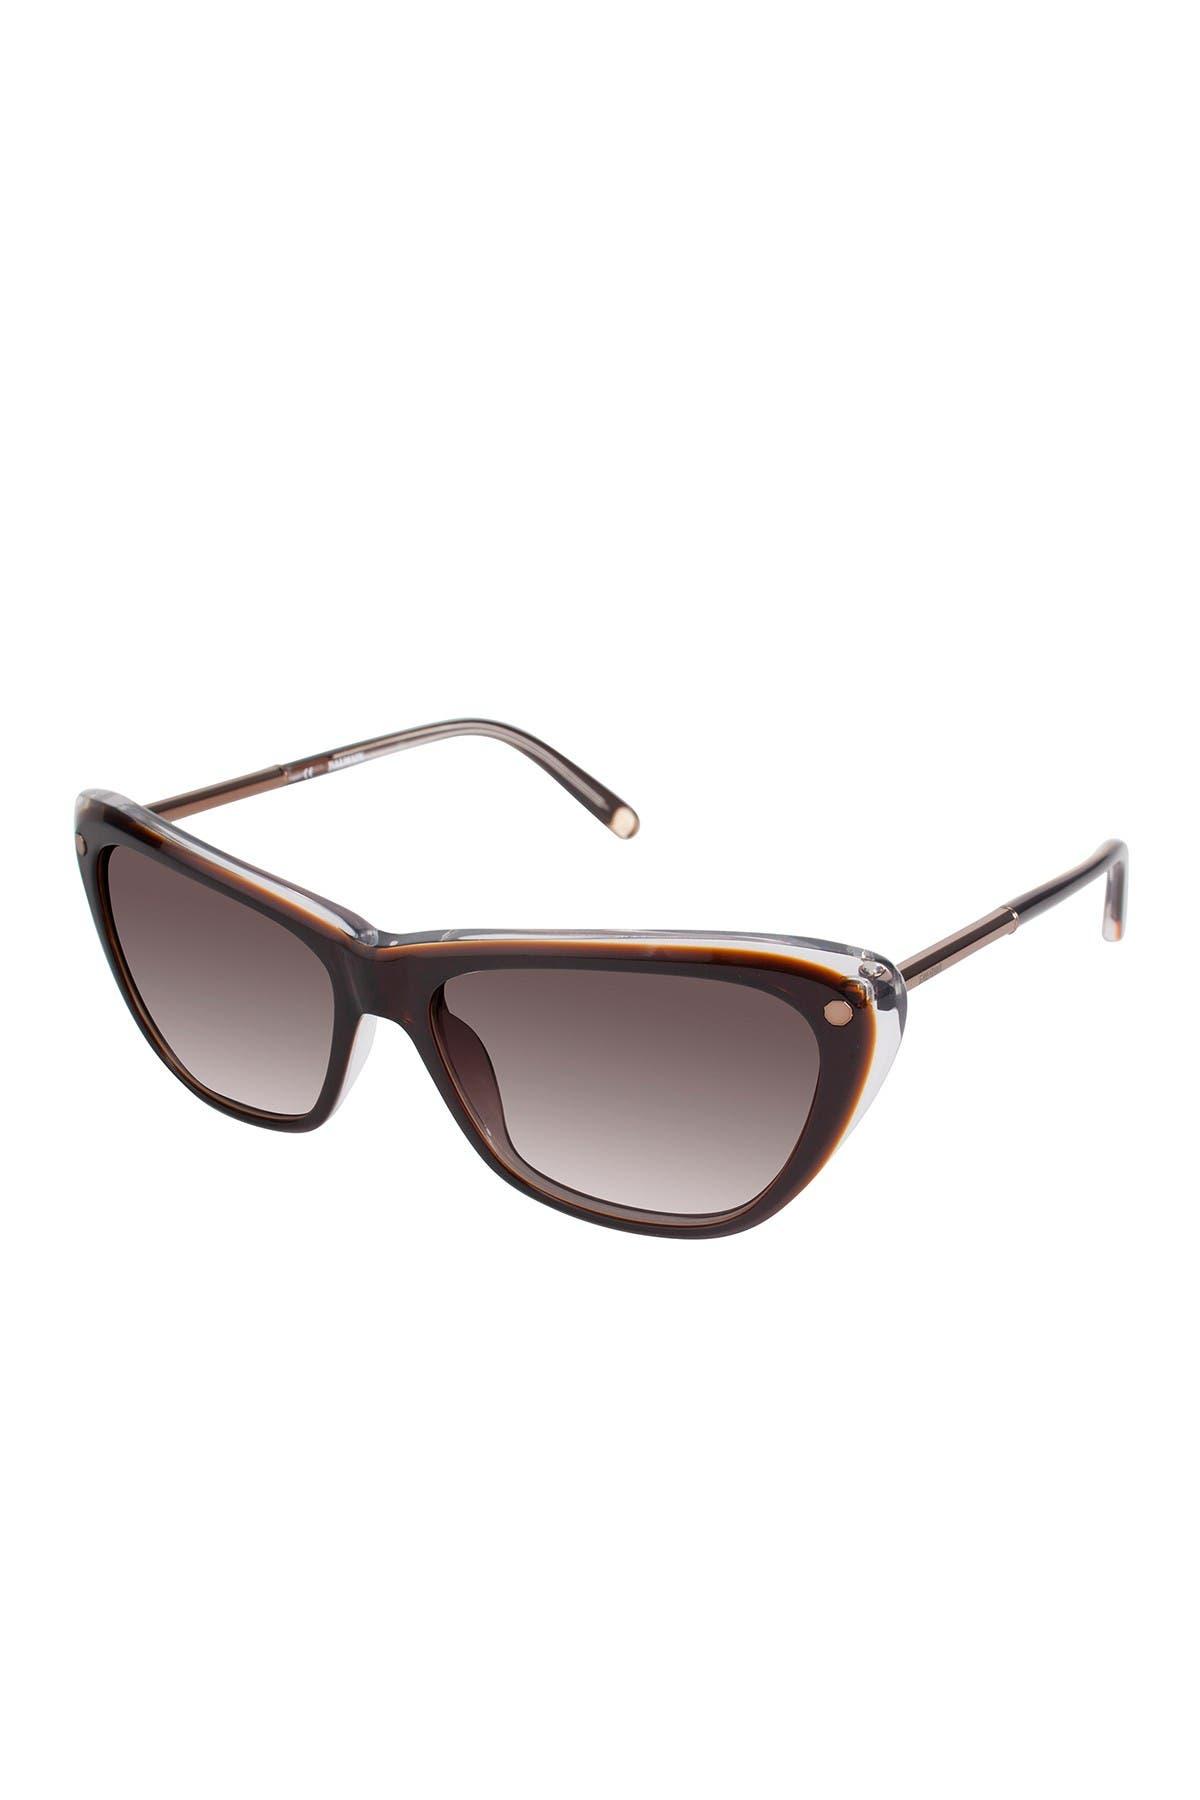 Image of Balmain 56mm Modified Cat Eye Sunglasses